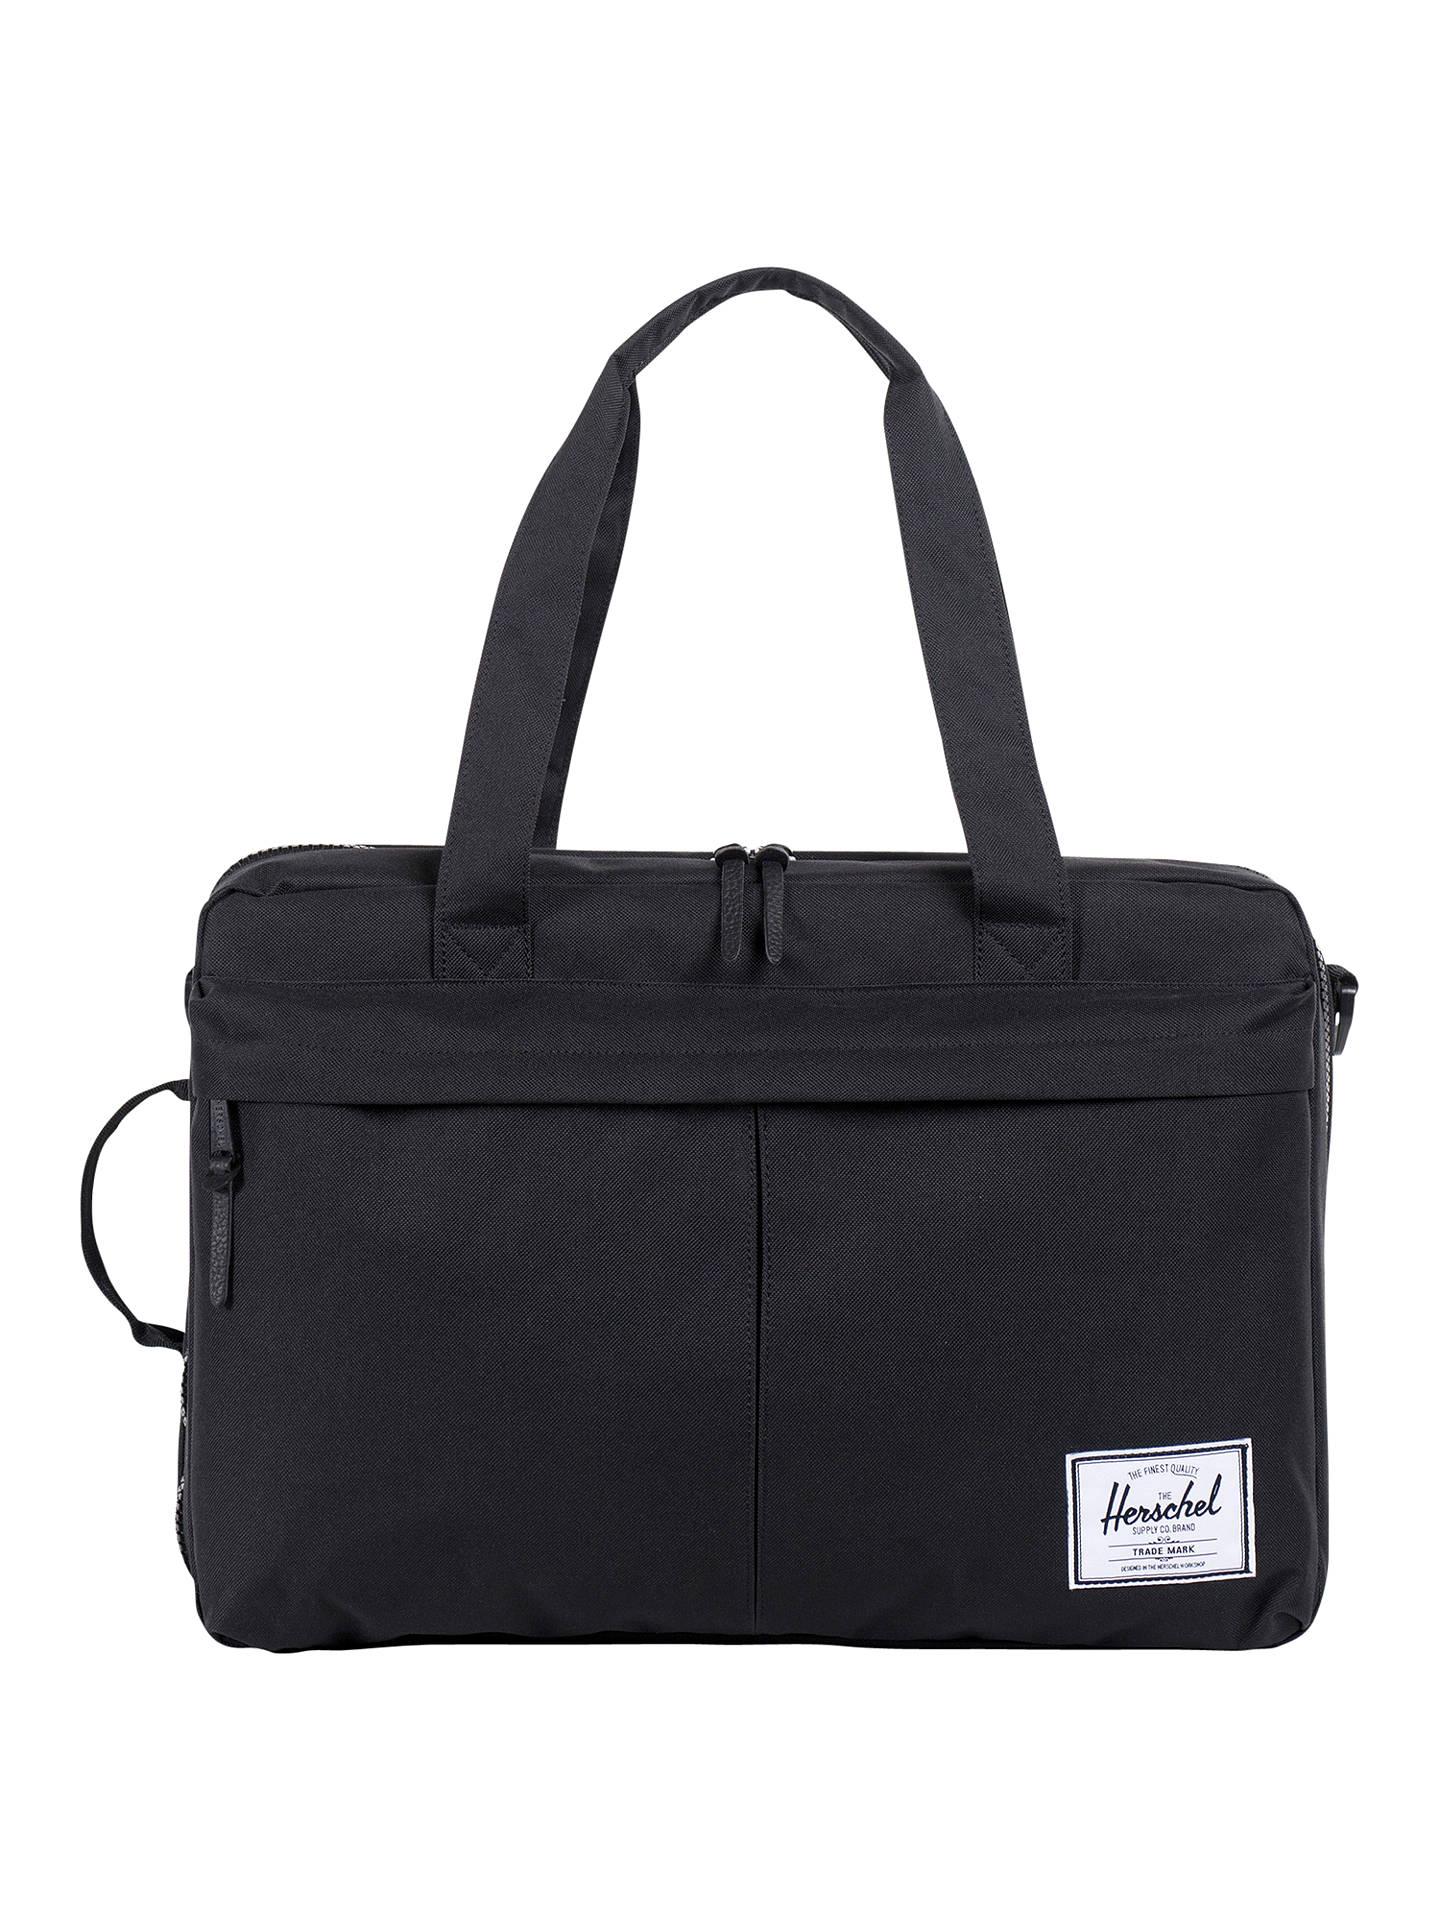 BuyHerschel Supply Co. Bowen Travel Duffle Bag 0bd127451a990